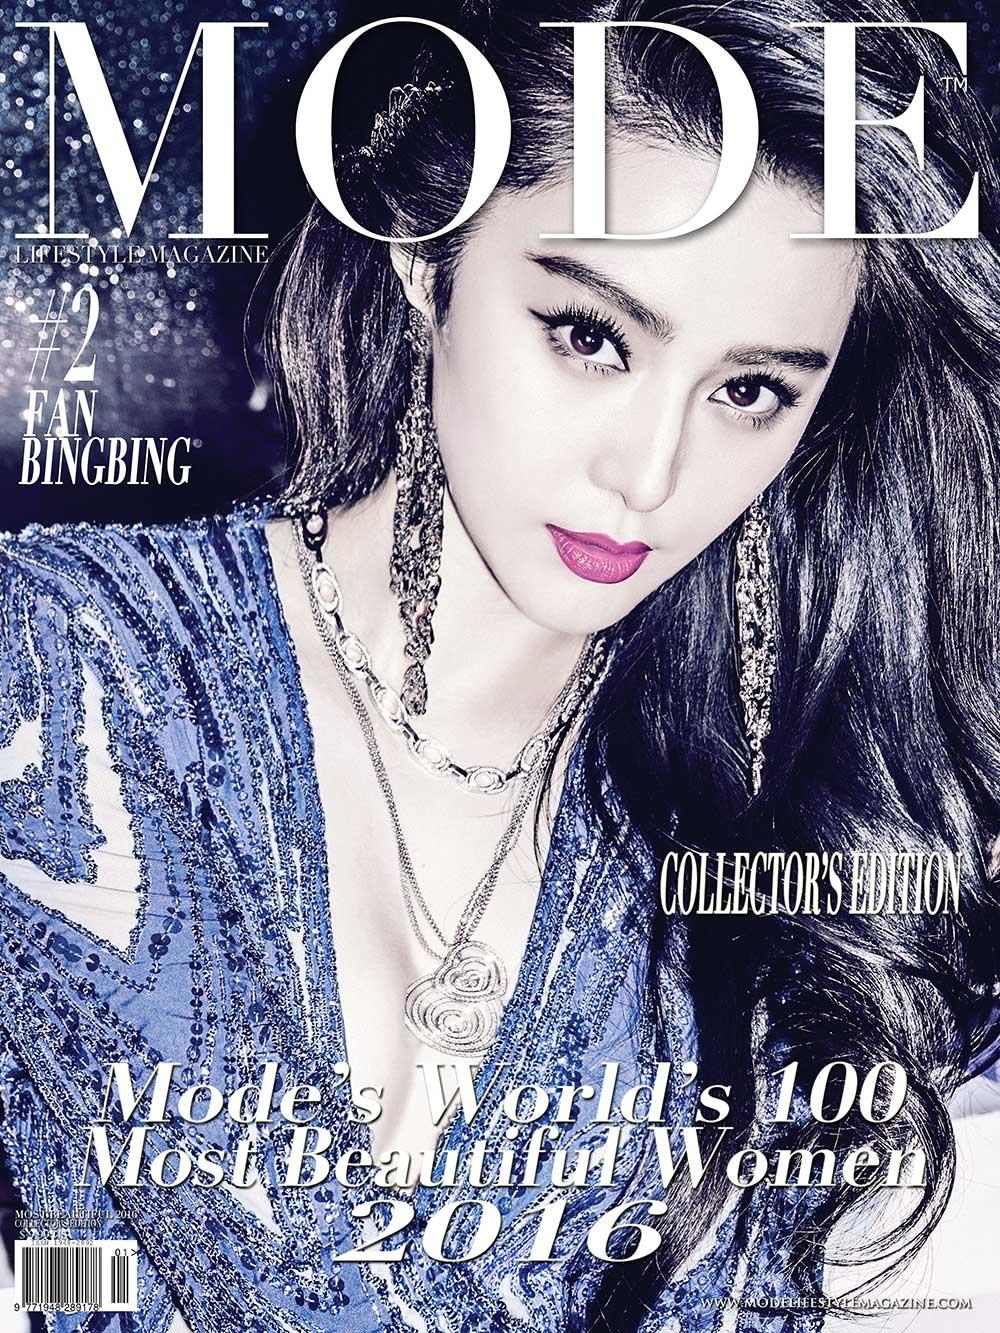 COVER - #2 Fan Bingbing - MODE'S WORLD'S 100 MOST BEAUTIFUL WOMEN 2016. Photo Courtesy of Fan Bingbing Studio